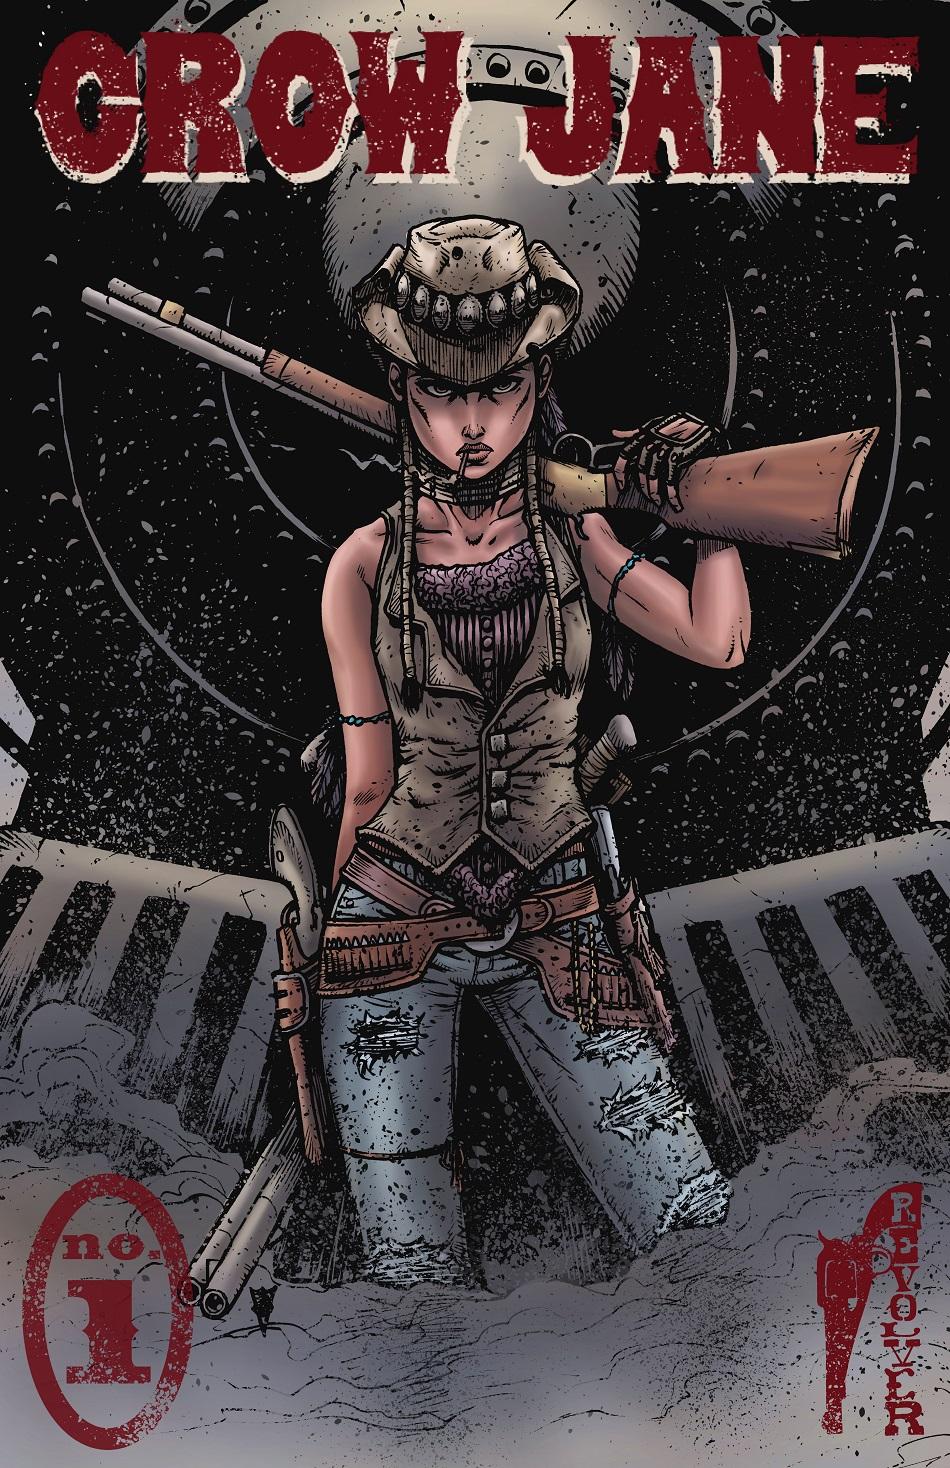 Crow Jane: The Season of Revenge book 1 alternate cover